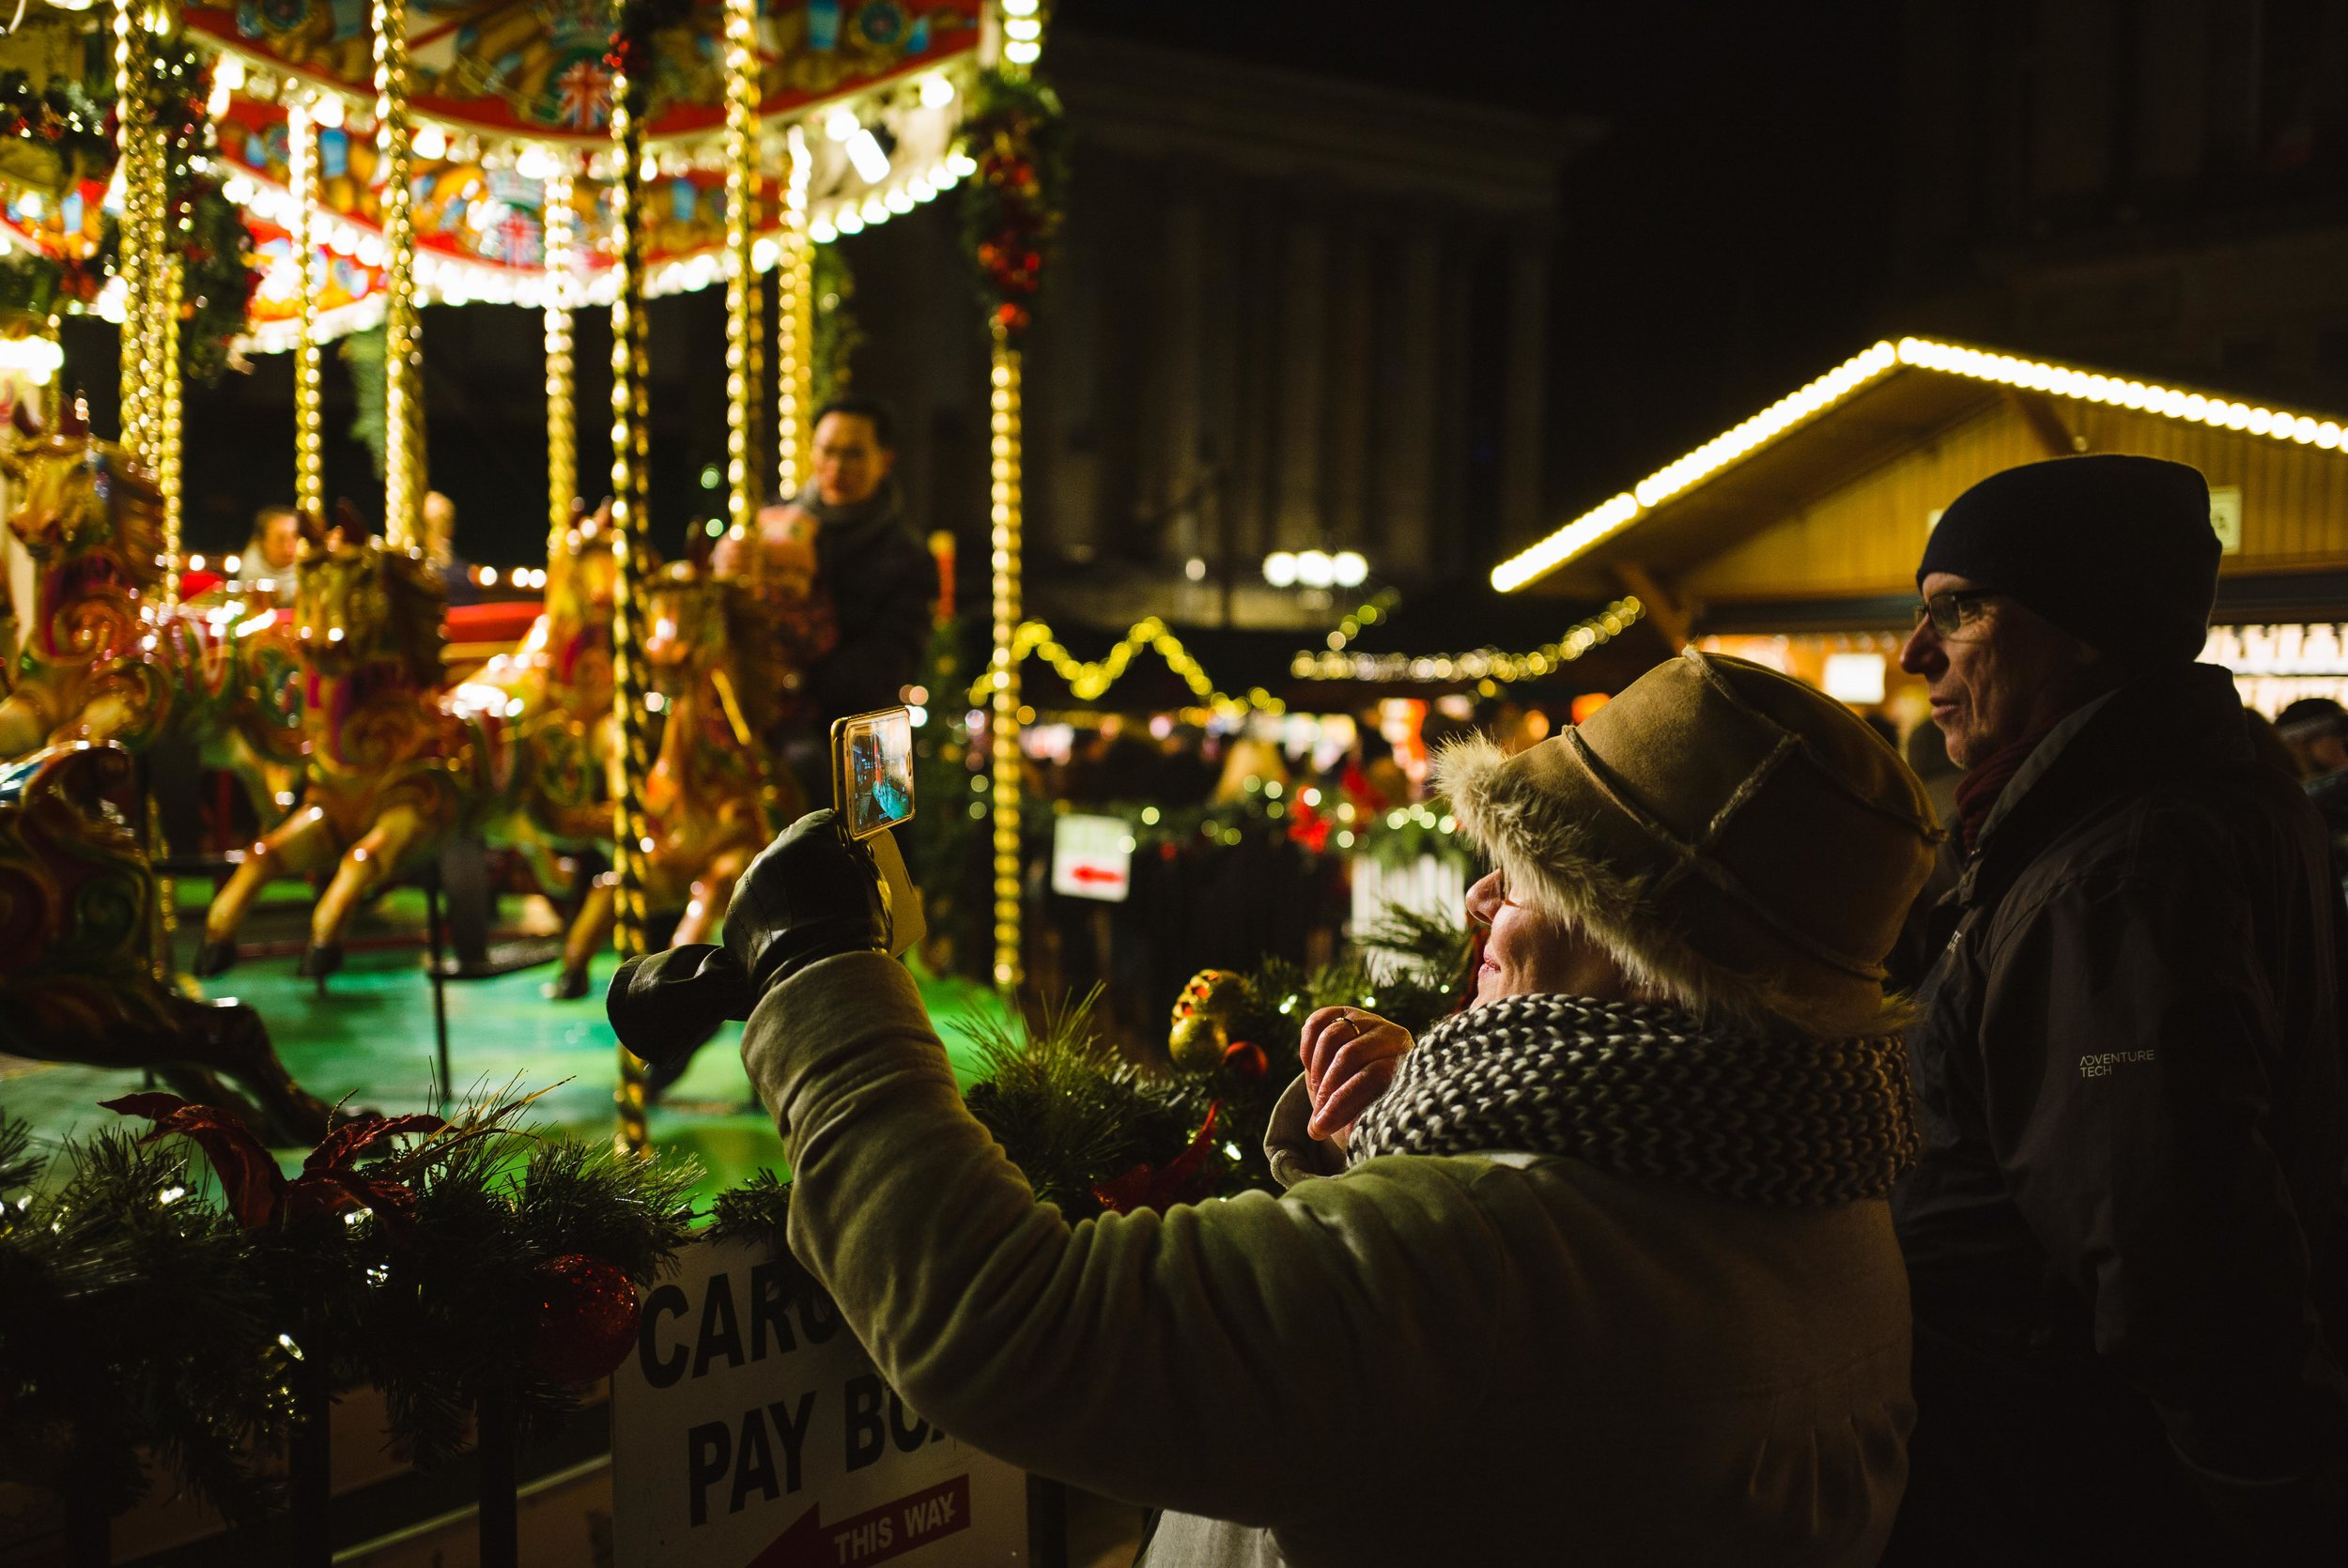 Birmingham Frankfurt Christmas Market - Clifford Darby 2016